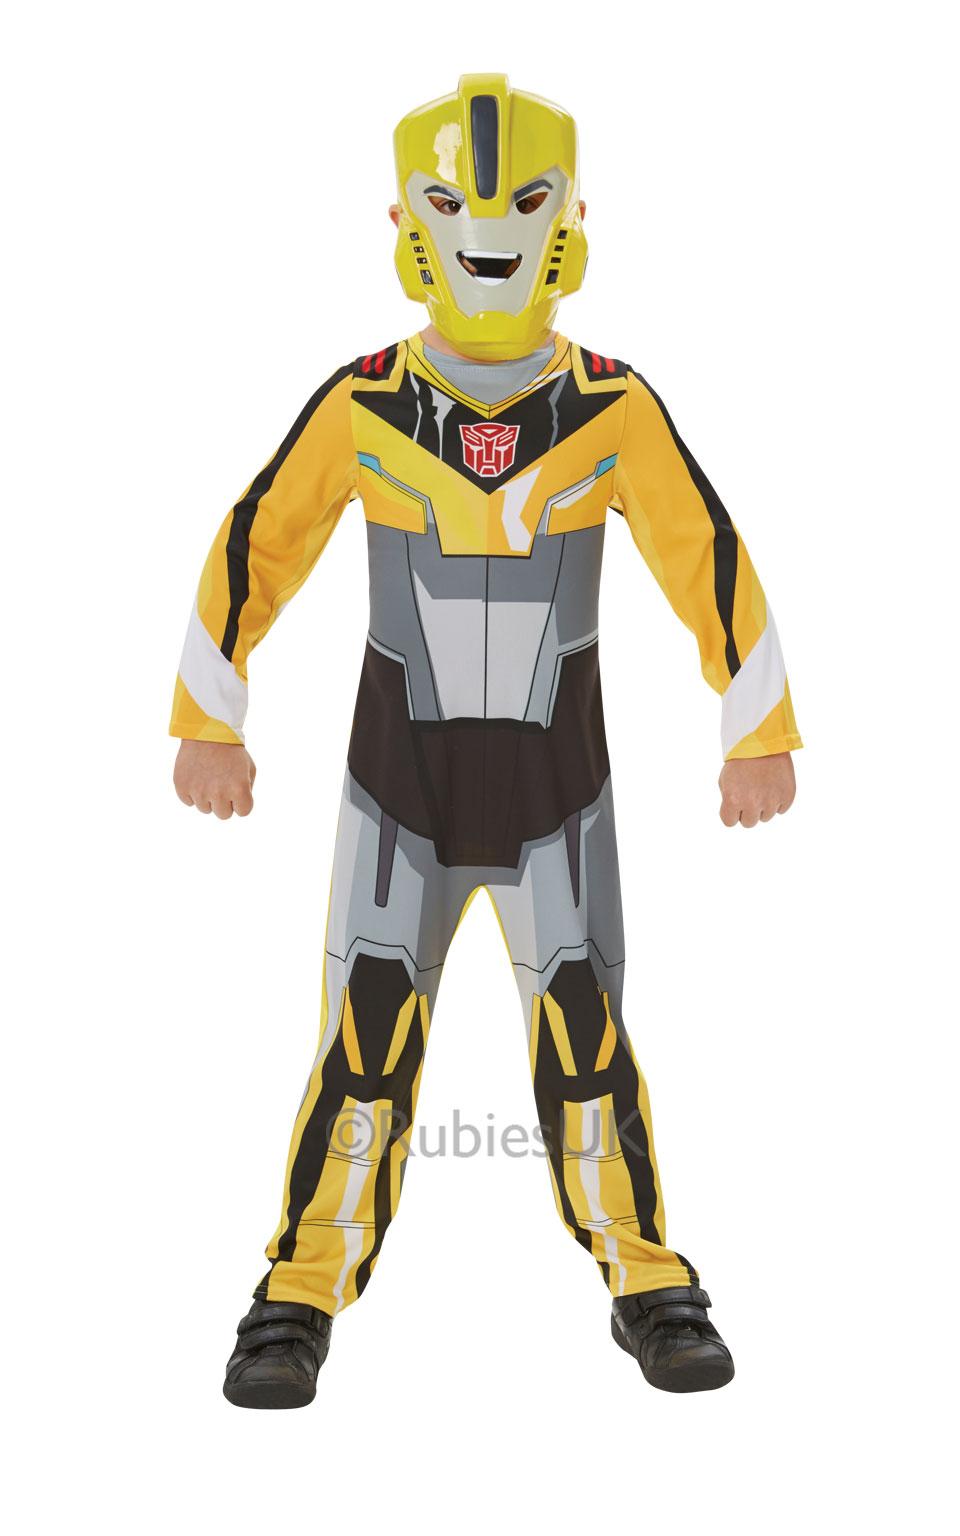 Bumble Bee Classic Costume  sc 1 st  Mega Fancy Dress & Bumble Bee Classic Costume | Kids Halloween Costumes | Mega Fancy Dress